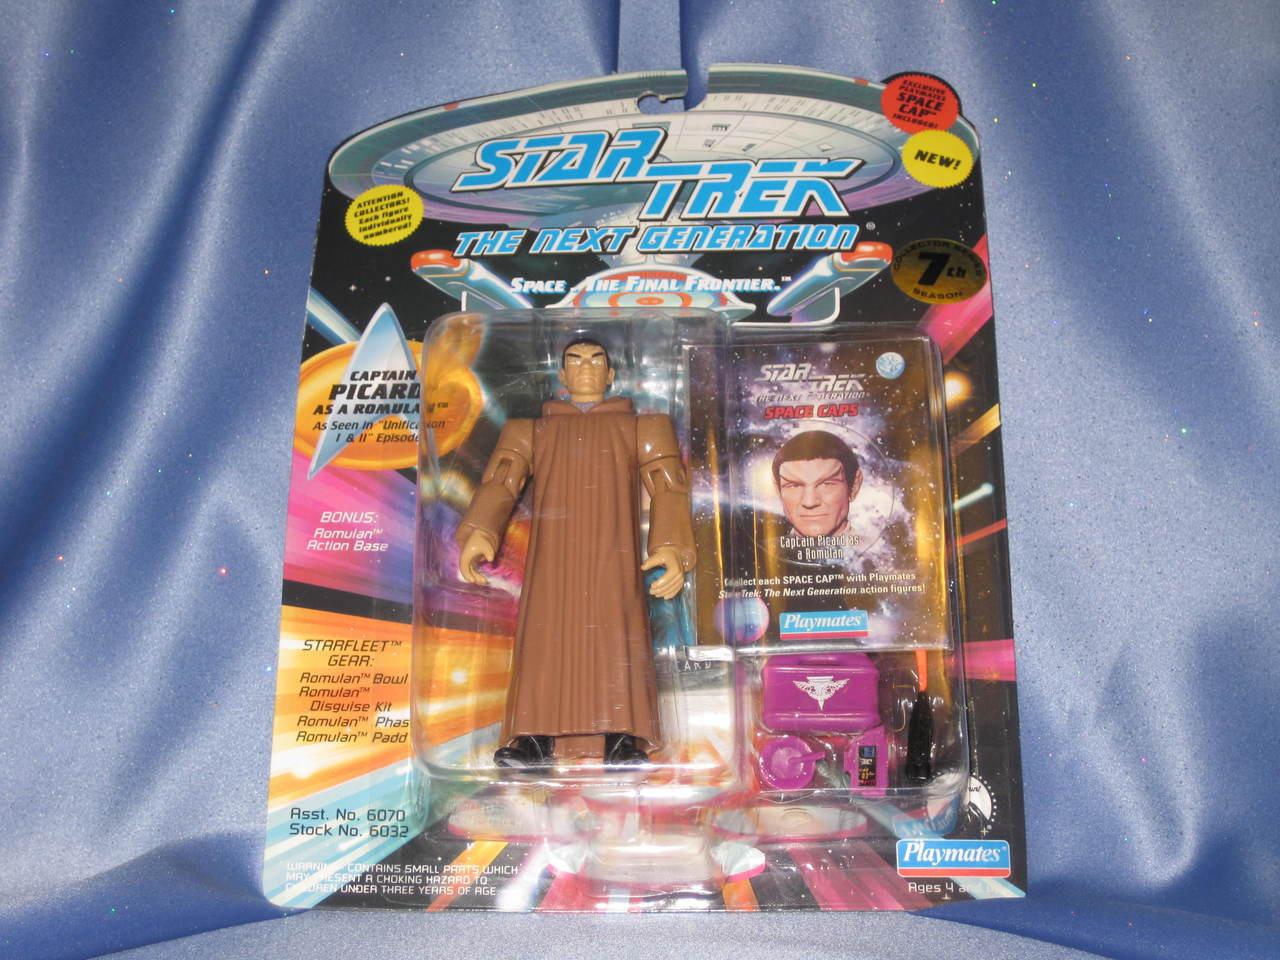 Star Trek - The Next Generation - Captain Picard as a R